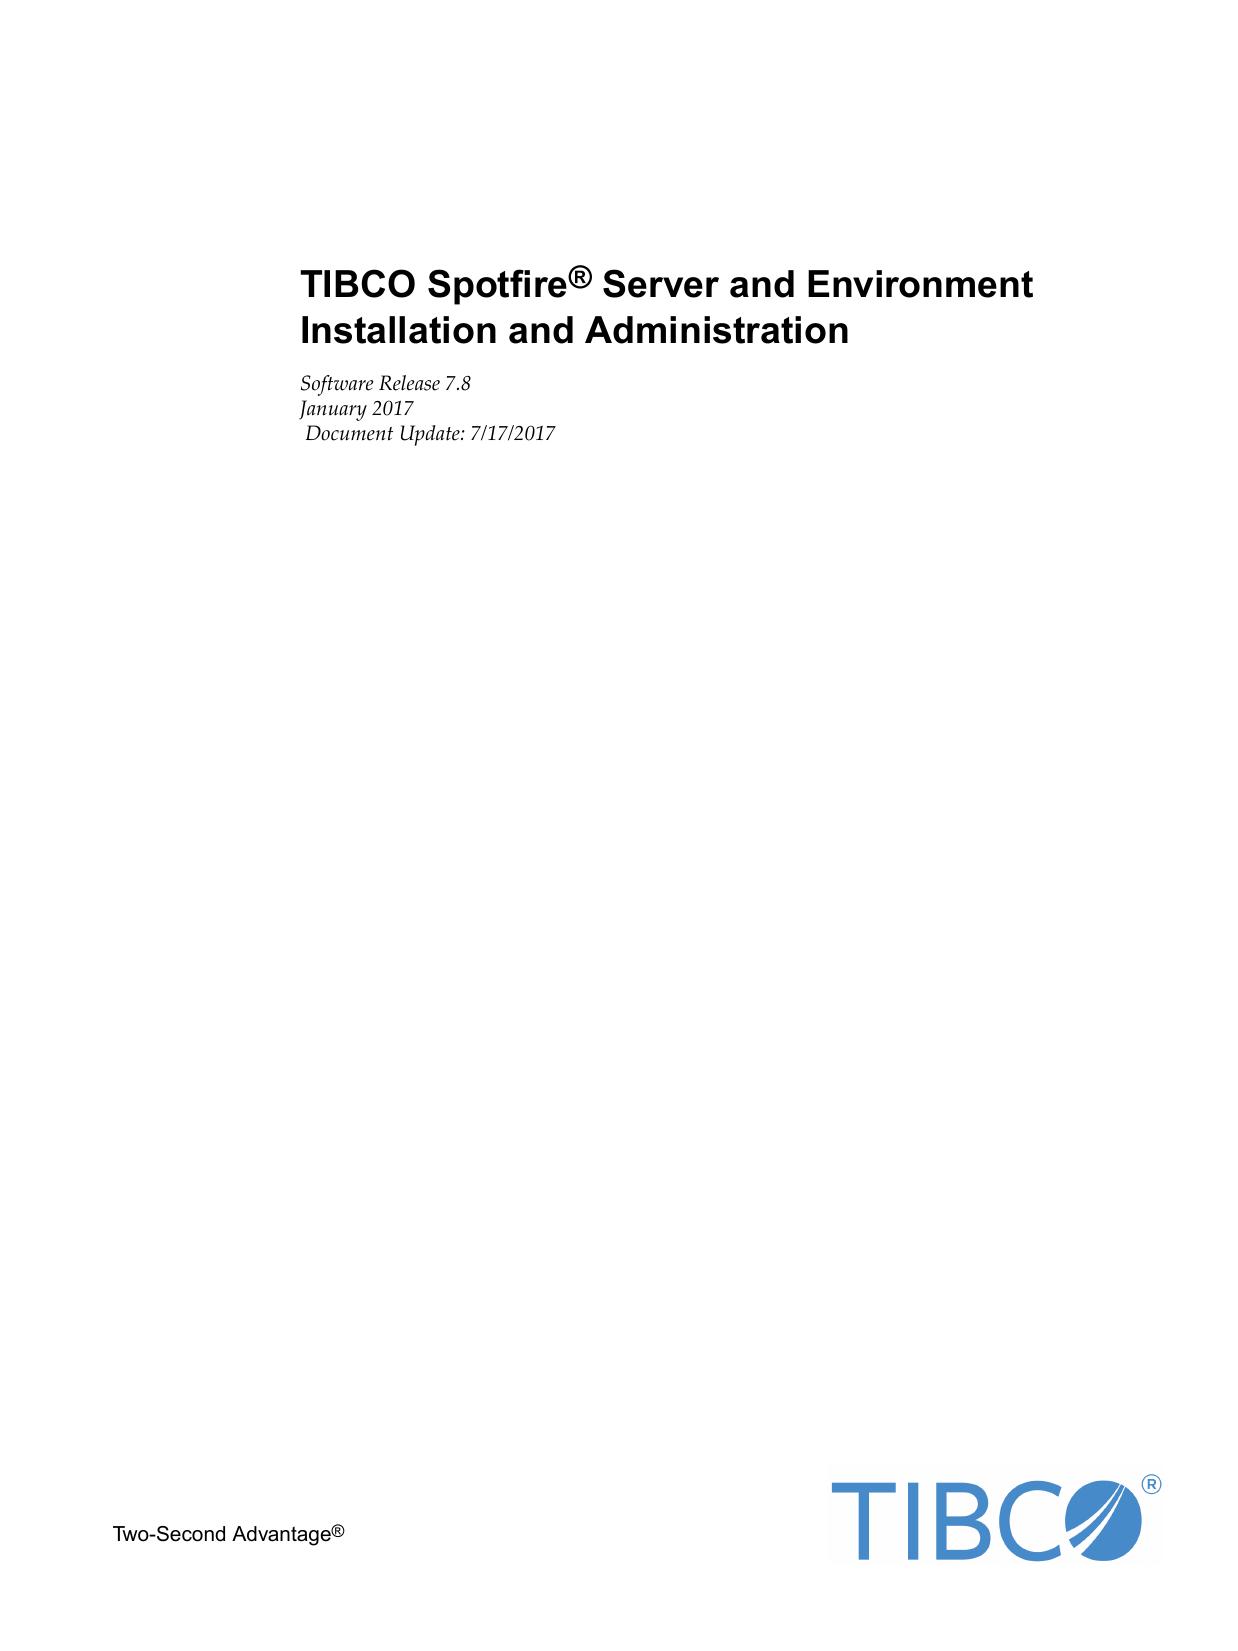 TIBCO Spotfire® Server and Environment - Installation